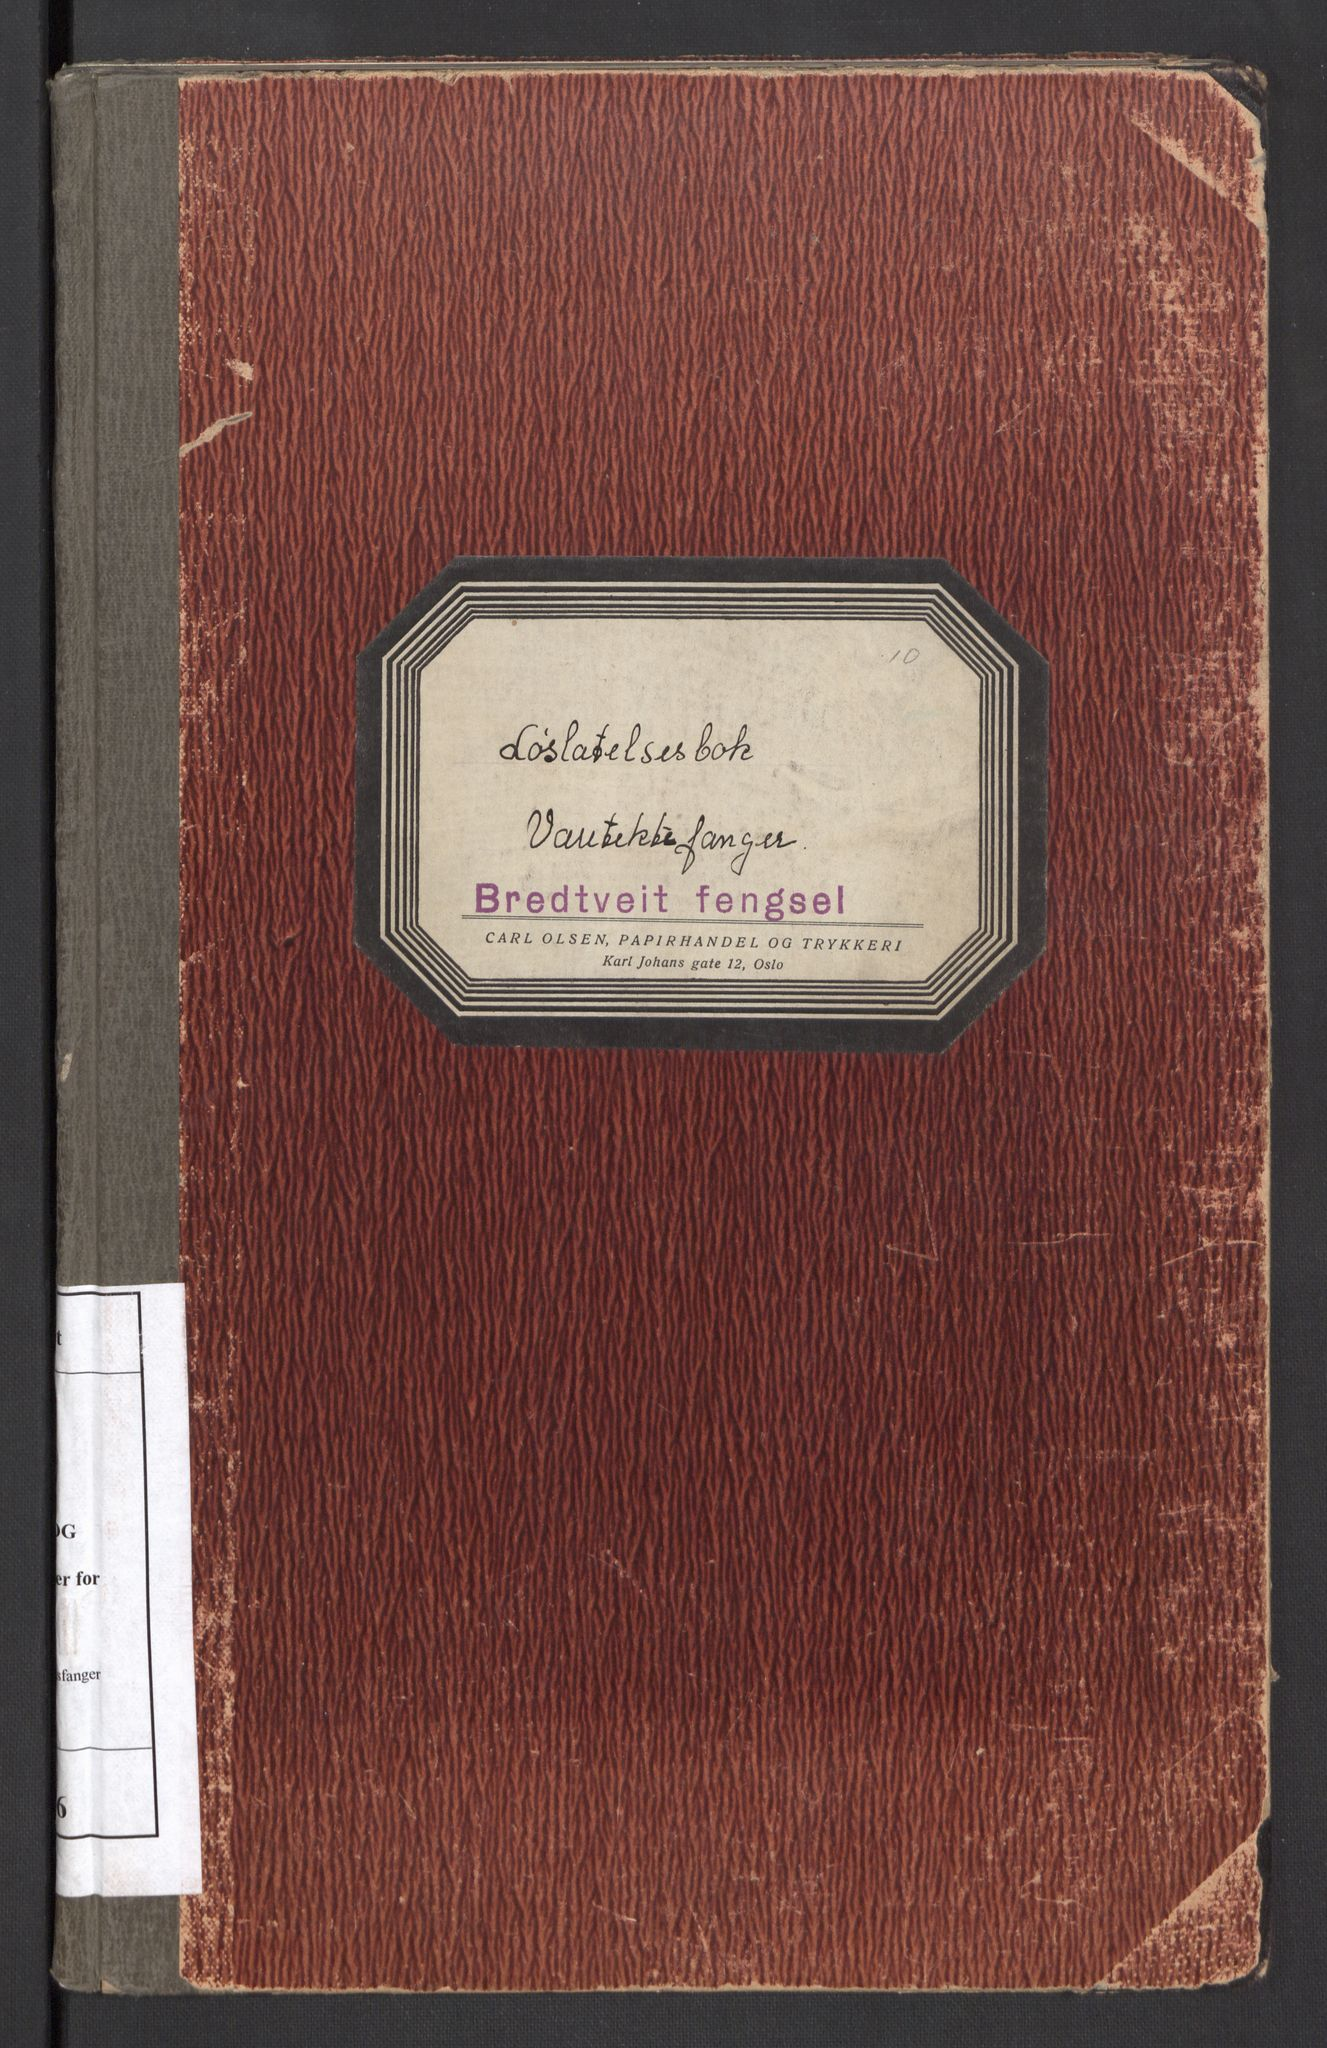 RA, Statspolitiet - Hovedkontoret / Osloavdelingen, C/Cl/L0006: Løslatelsesboks - varetektsfanger, 1941-1943